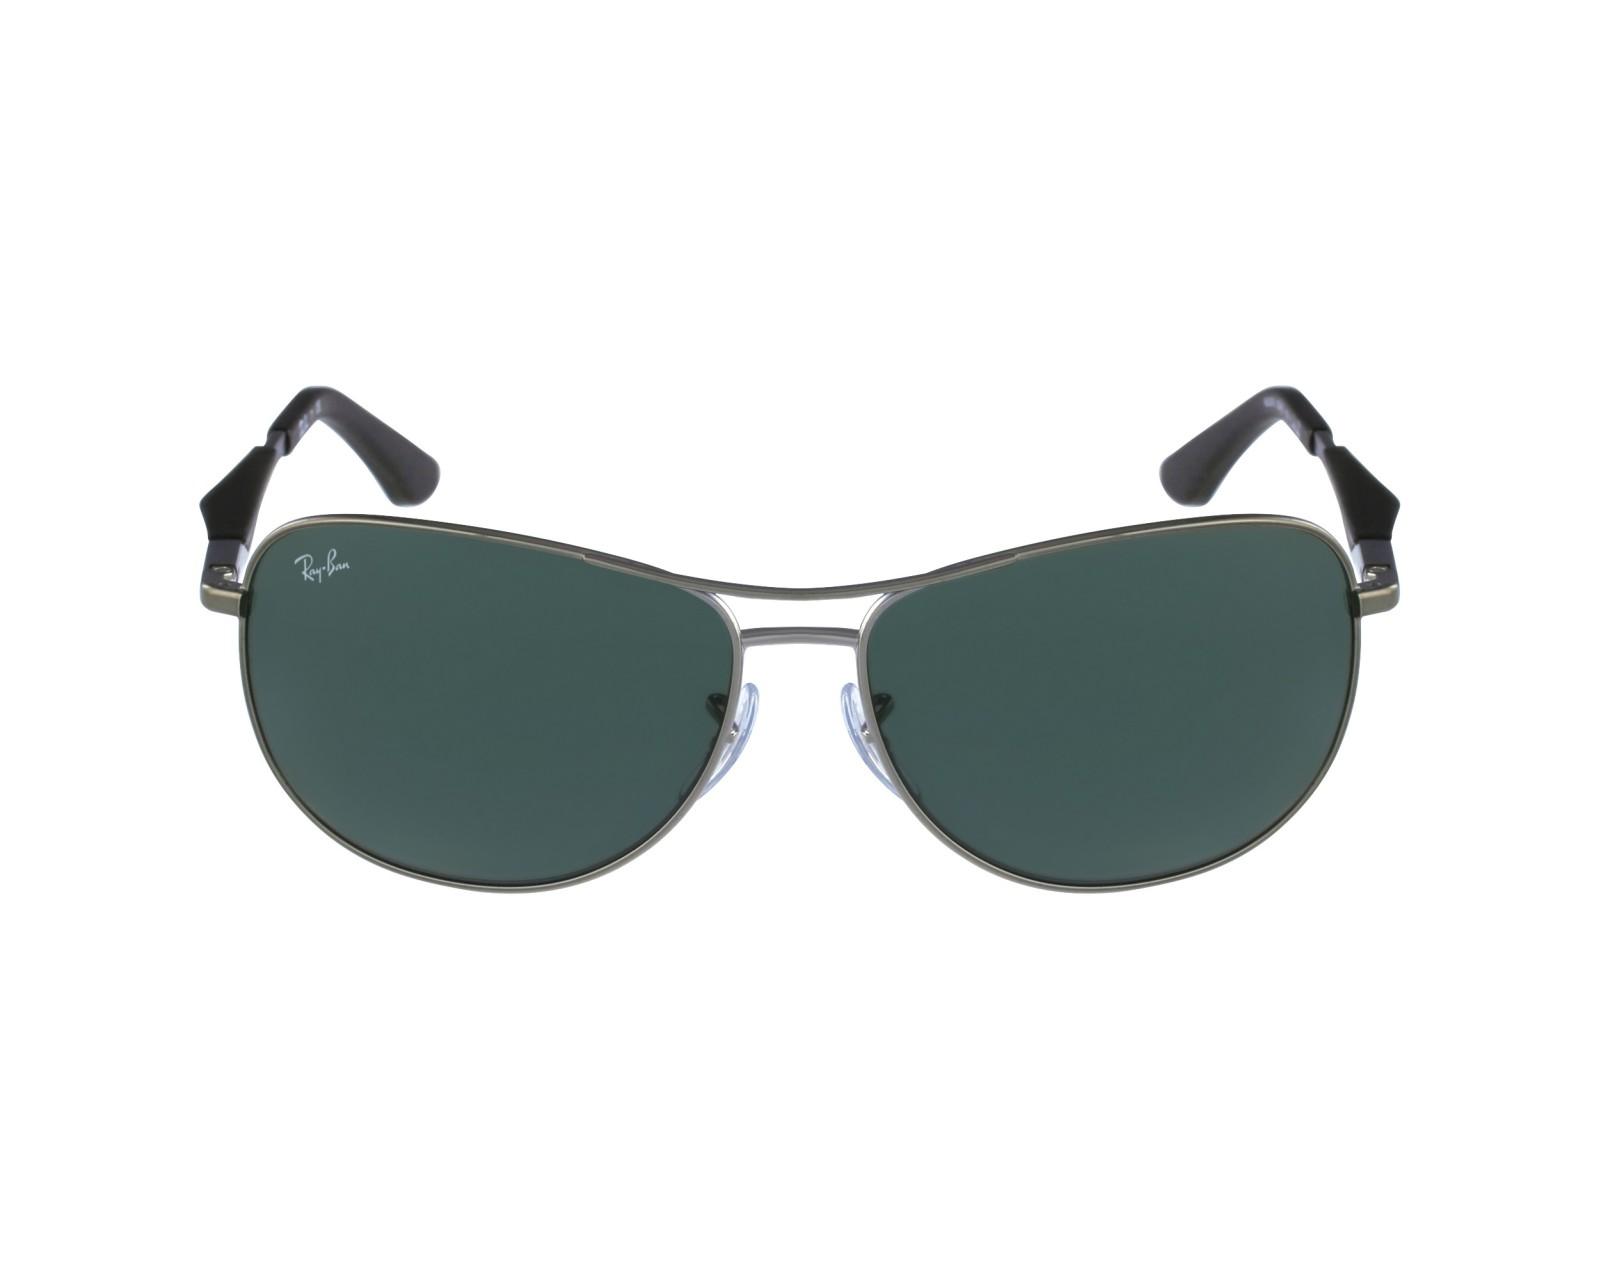 8f42a76b6f thumbnail Sunglasses Ray-Ban RB-3519 004 71 - Gun Black profile view